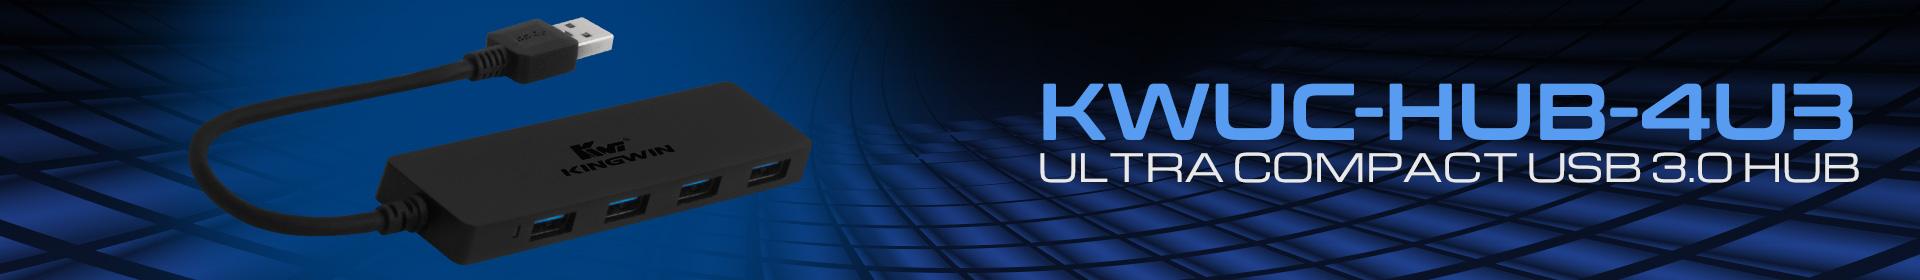 KWUC-HUB-4U3_WEB-BANNER